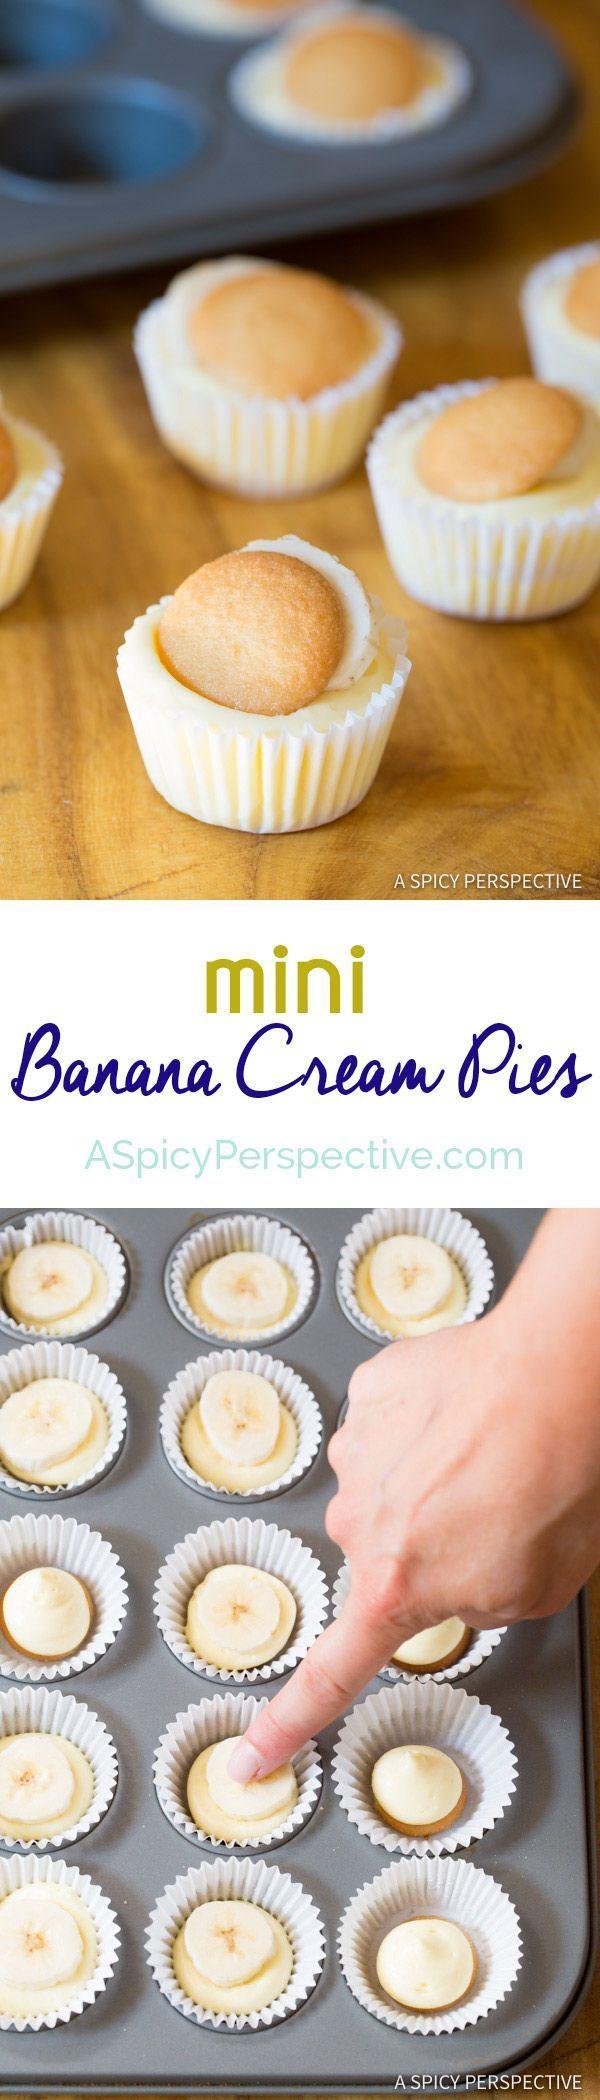 Fun to Make 6-Ingredient Mini Banana Cream Pie Recipe (Banana Pudding Tarts)